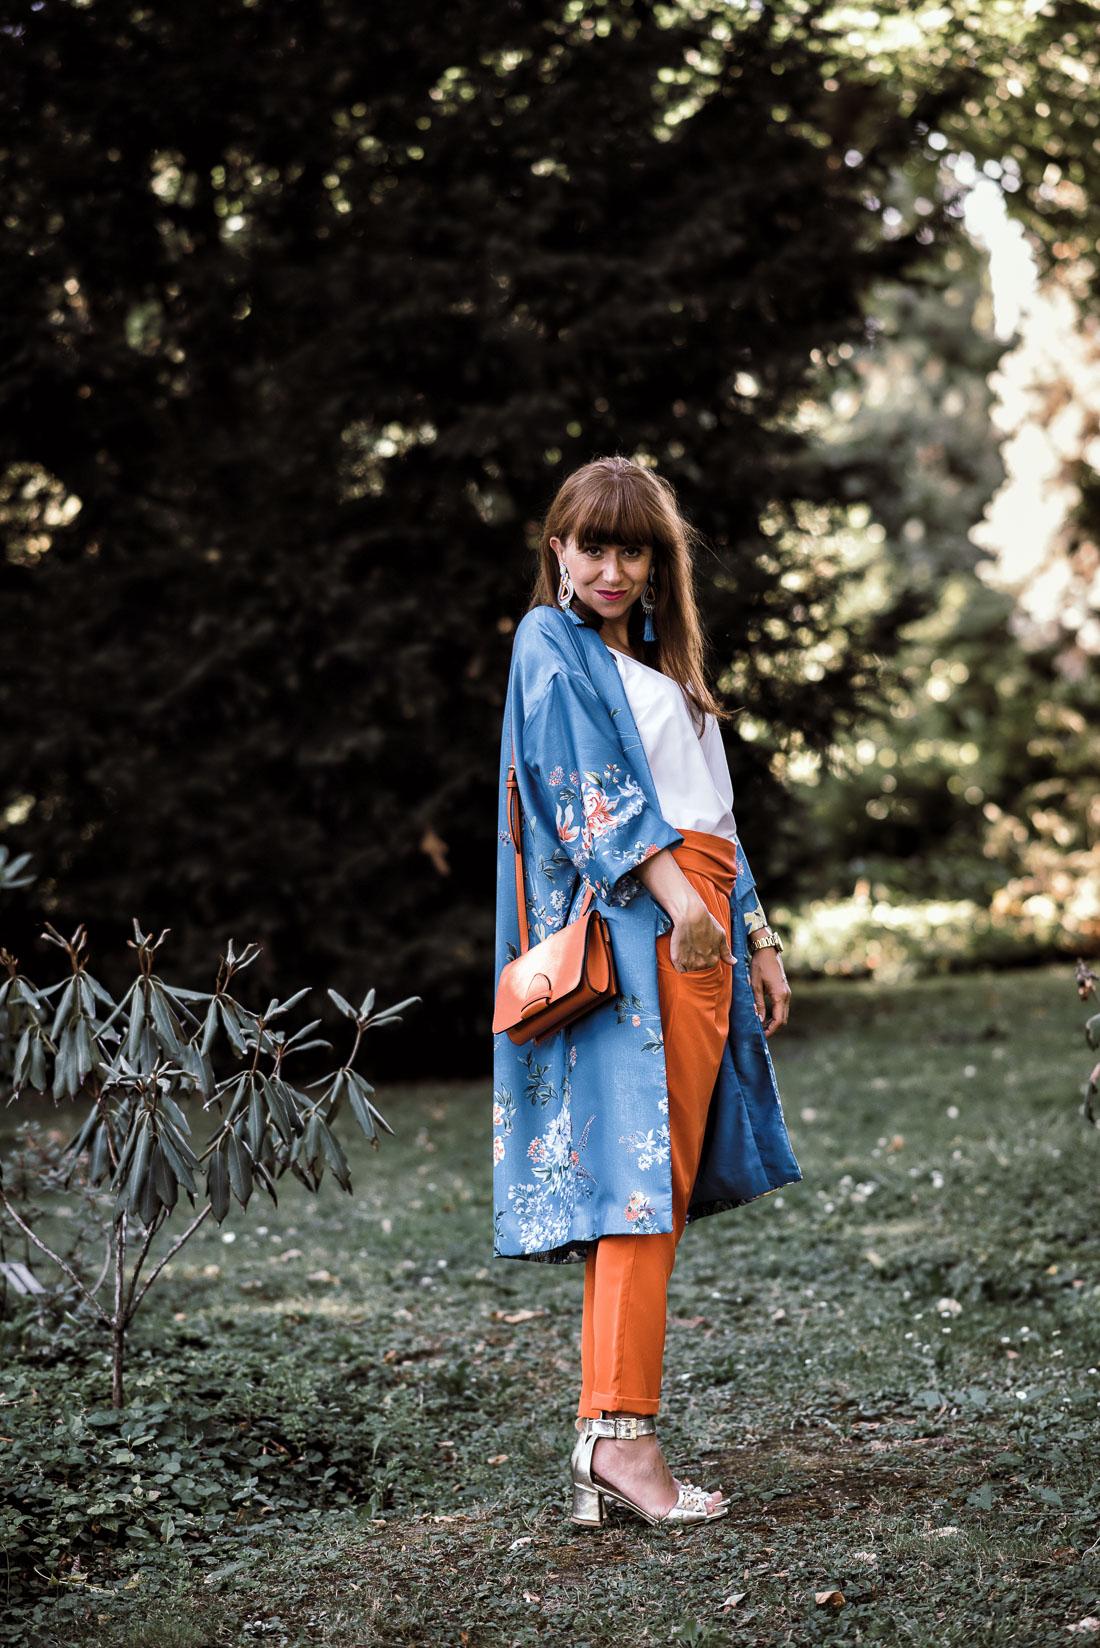 NOVÝ BYT, NOVÉ MOŽNOSTI_Katharine-fashion is beautiful_blog 14_Náušnice Bazu_Kvetinové kimono ZARA_Katarína Jakubčová_fashion blogerka